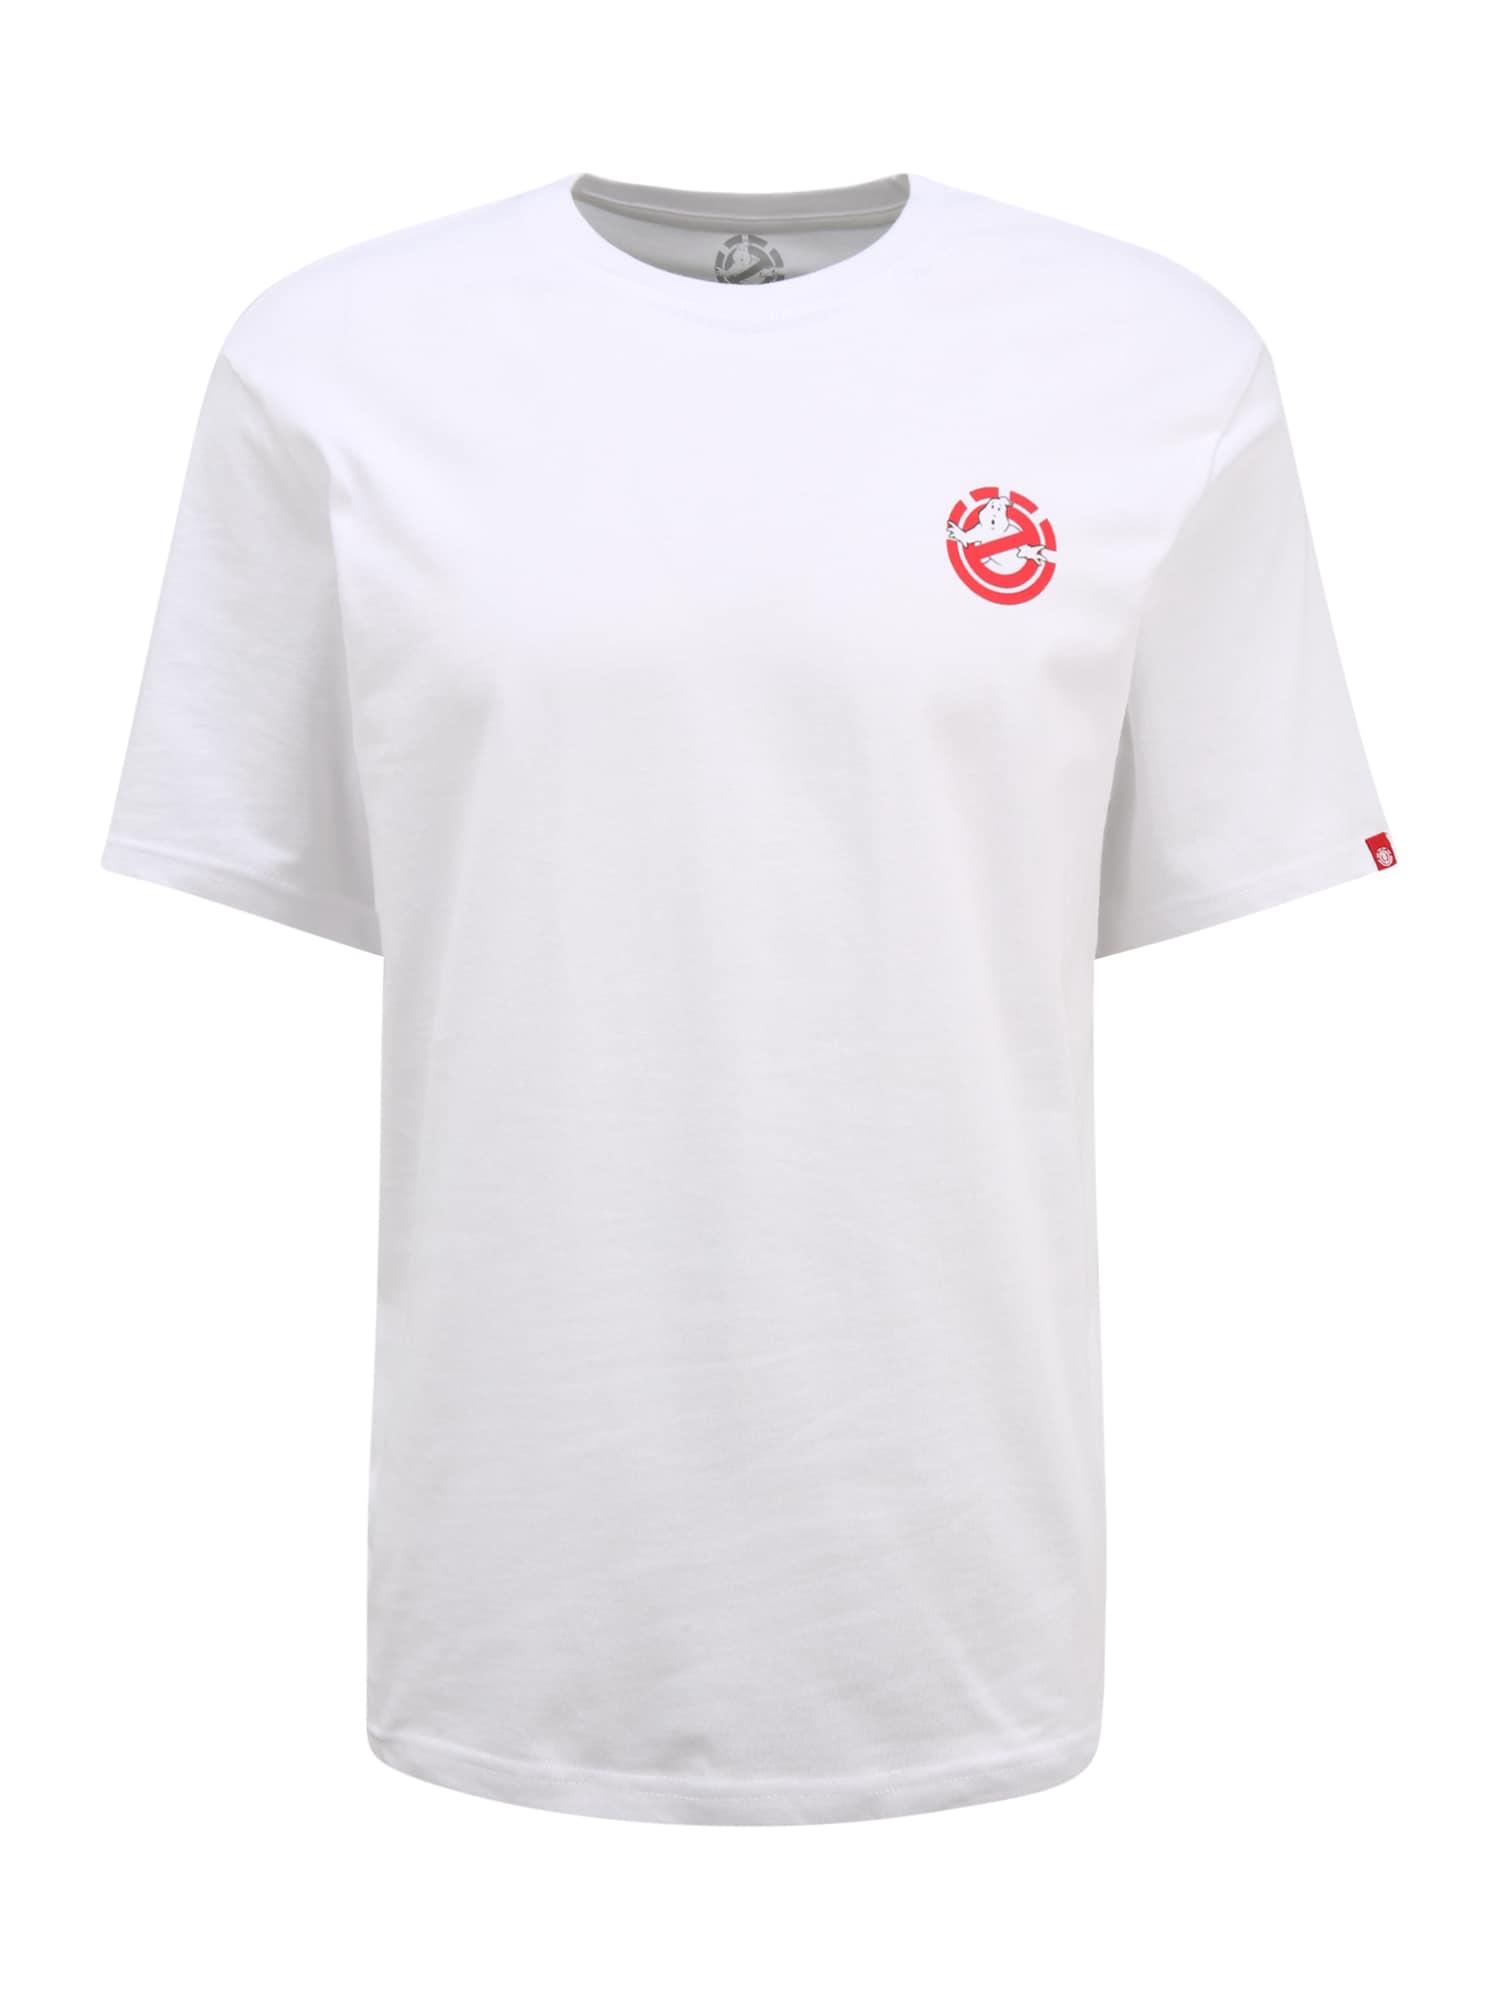 ELEMENT Tričko  biela / červená / modrá / tmavoružová / čierna pánské S